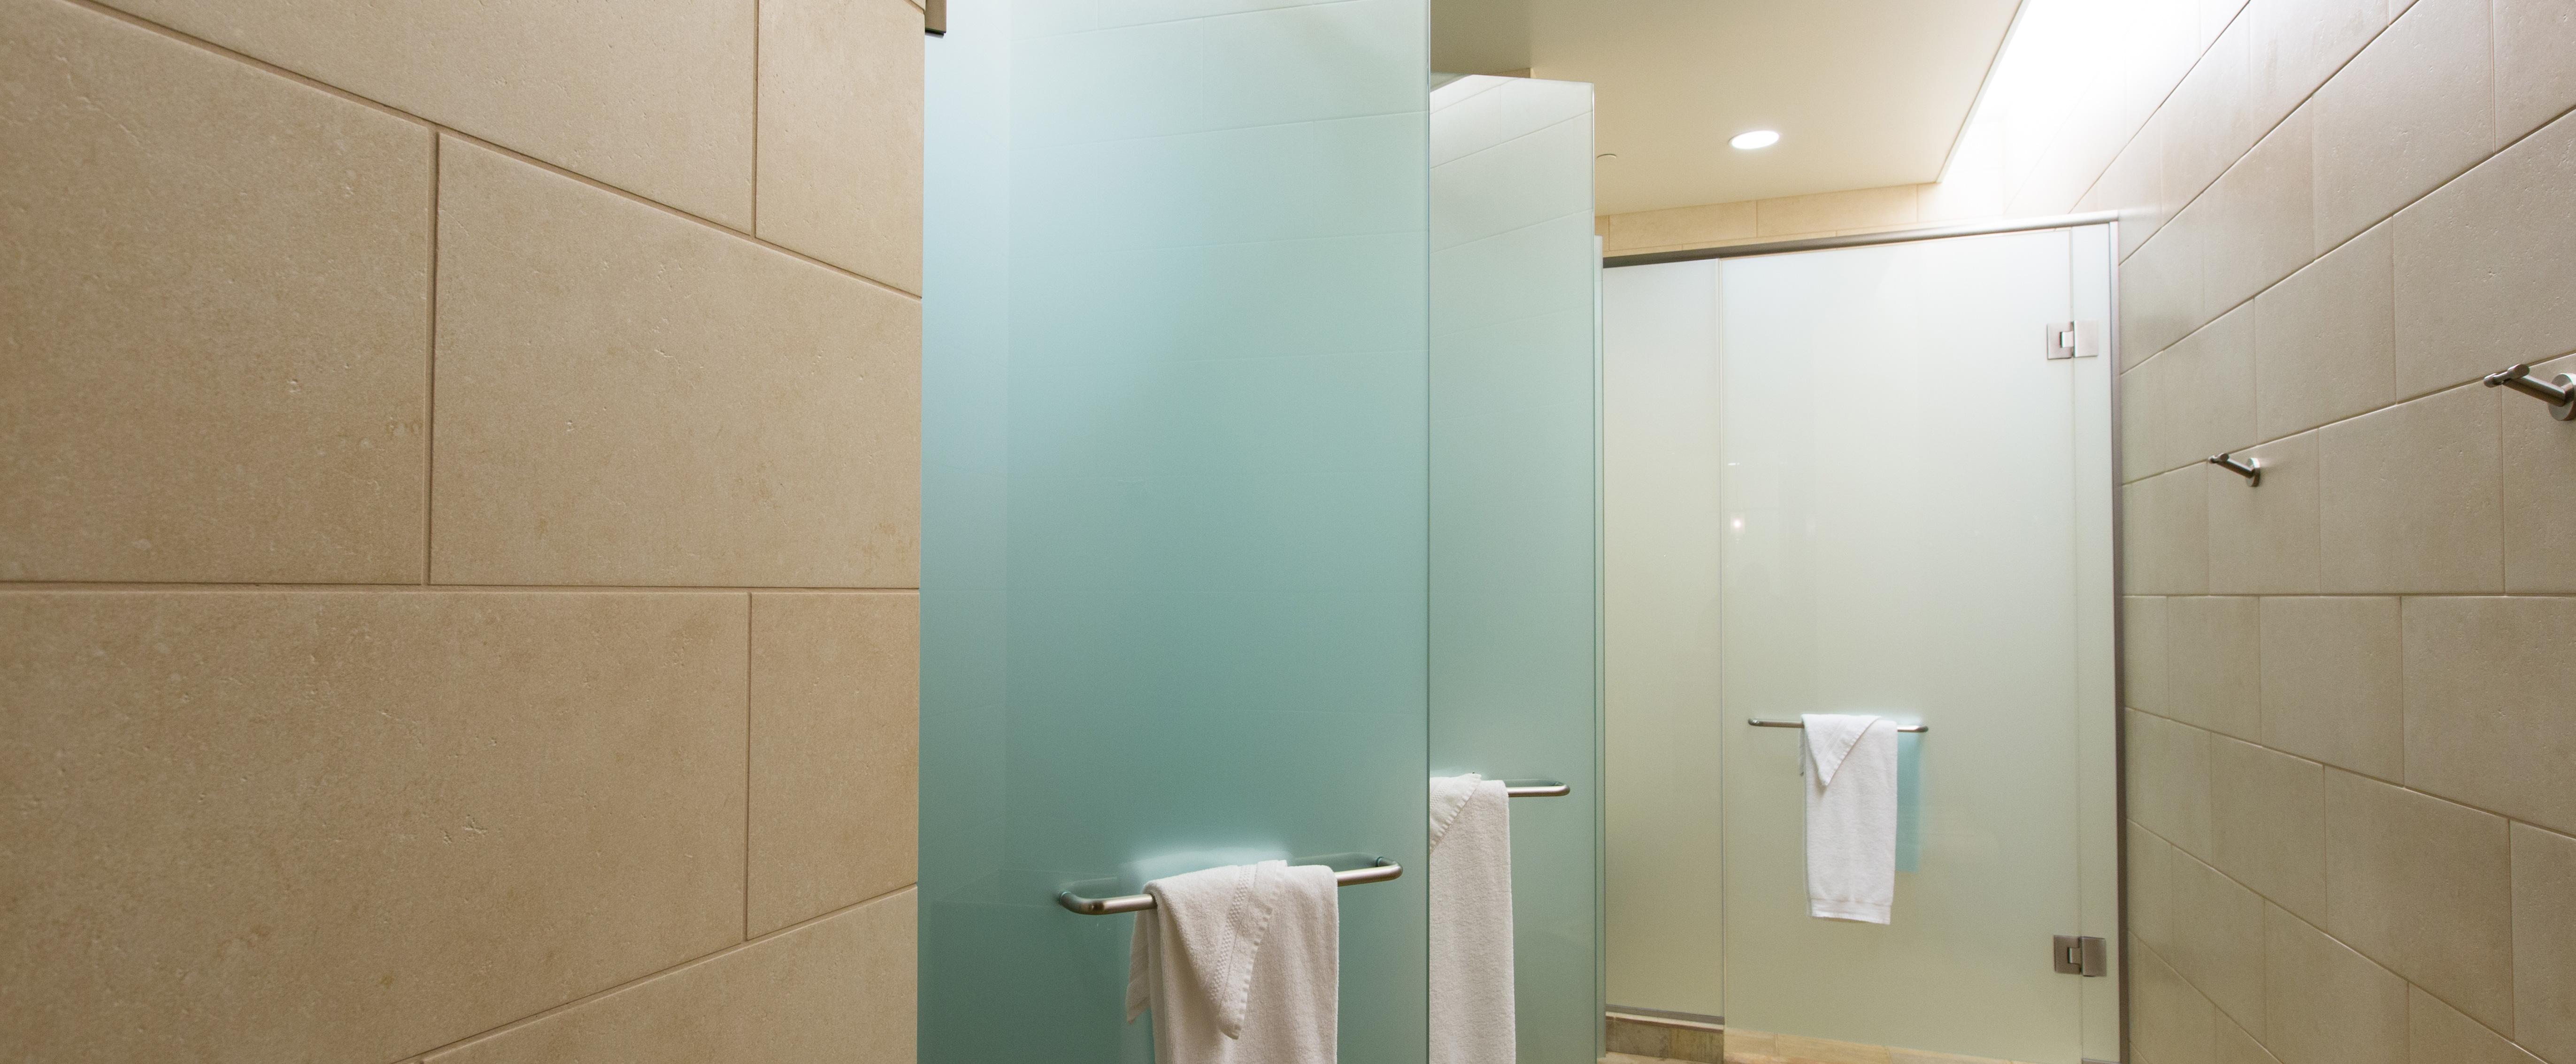 Spa Showers. Beautiful Spa Showers With Spa Showers. Spa Showers ...